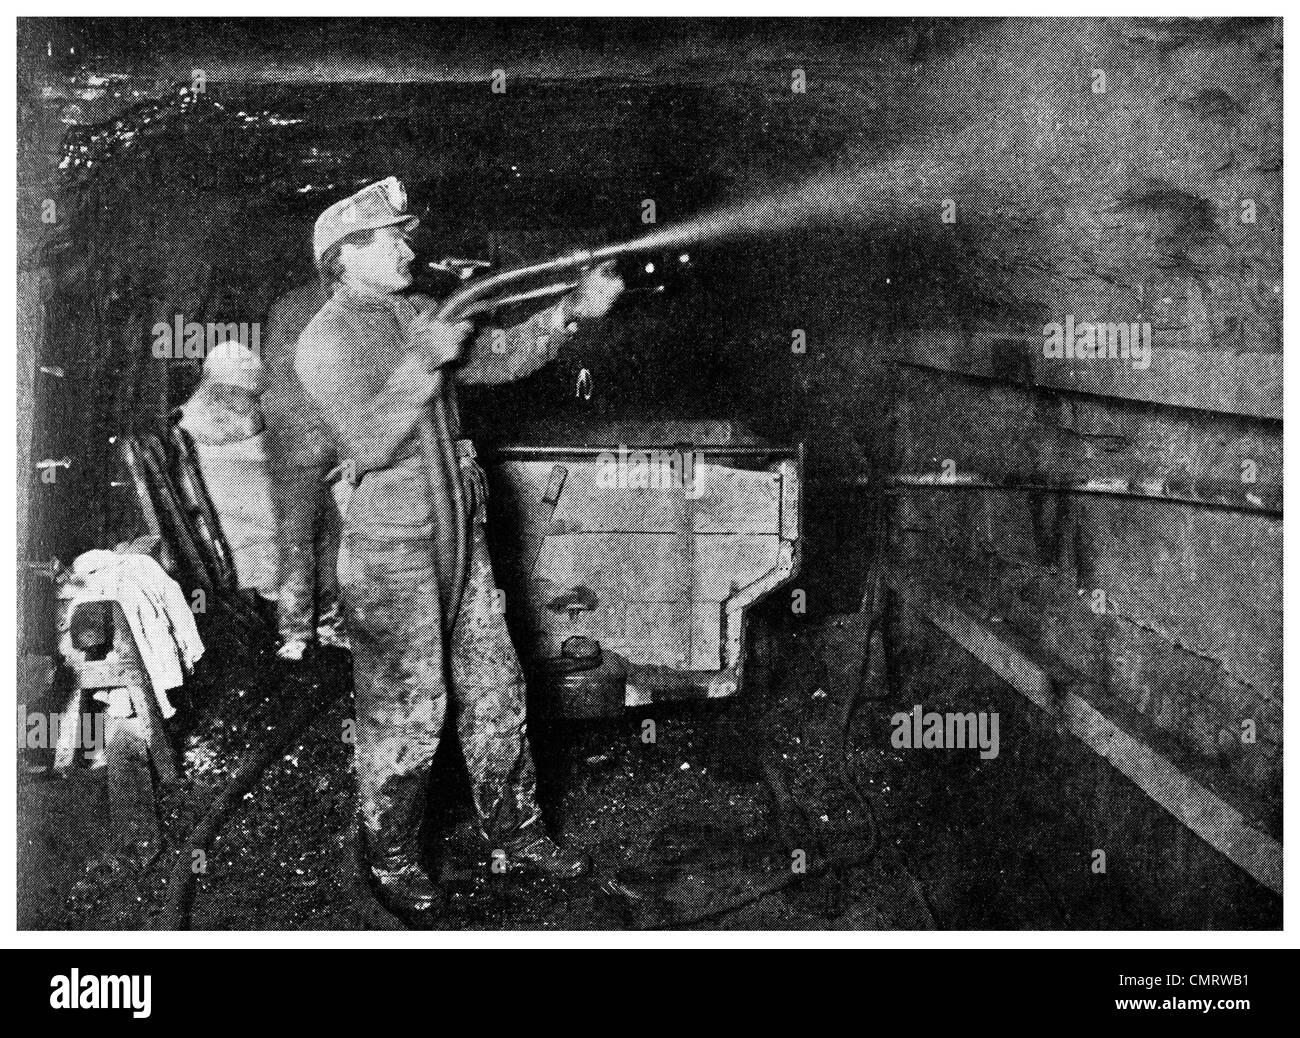 1918 coal mine lining wall with concrete miner Cork and Bottle Mine Scranton Pennsylvania - Stock Image